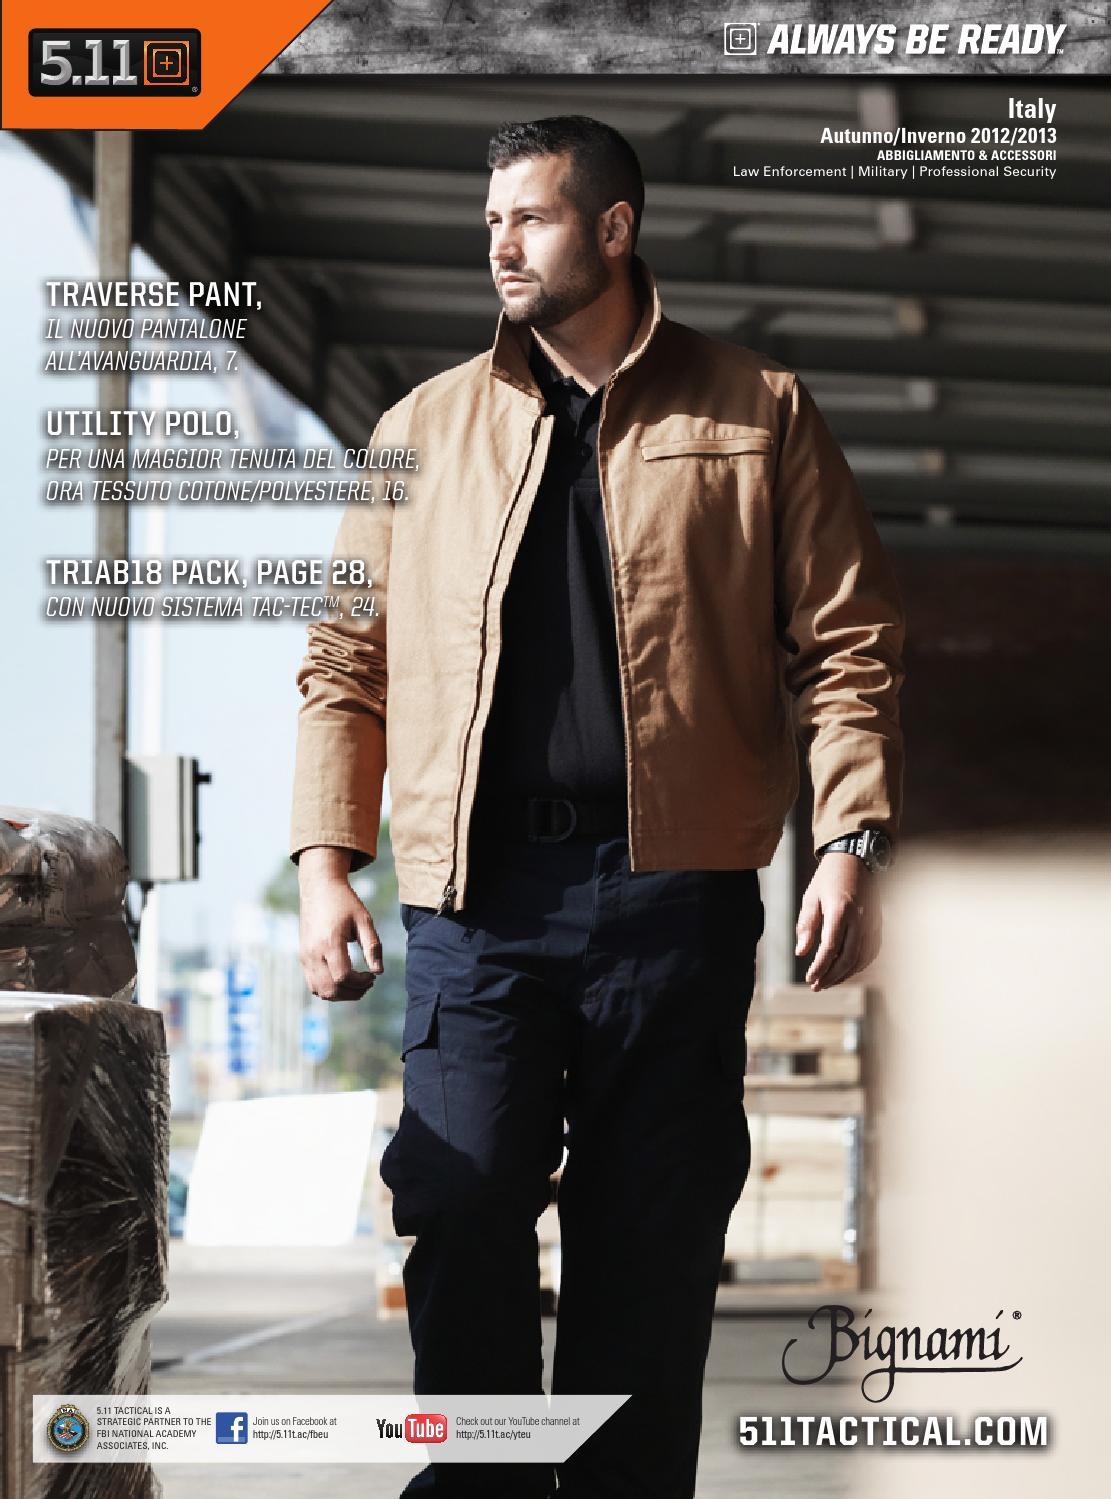 5.11 Tactical Taclite Tdu Gamba Corta Pantaloni Pantalone da uomo-Nero Tutte le Taglie